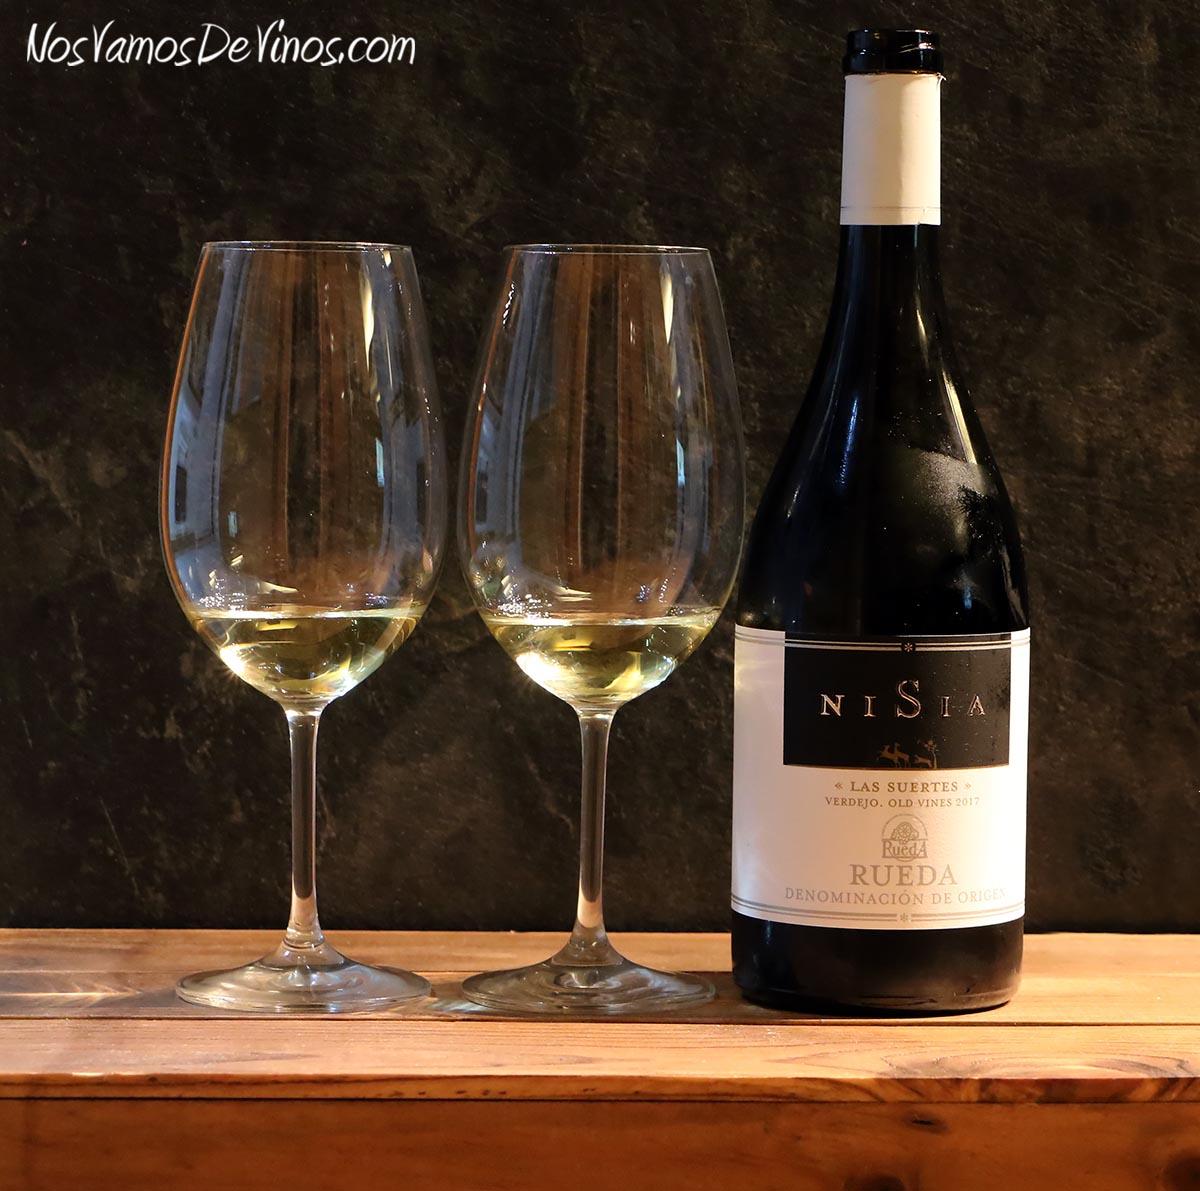 Nisia Las Suertes Verdejo Old Vines 2017